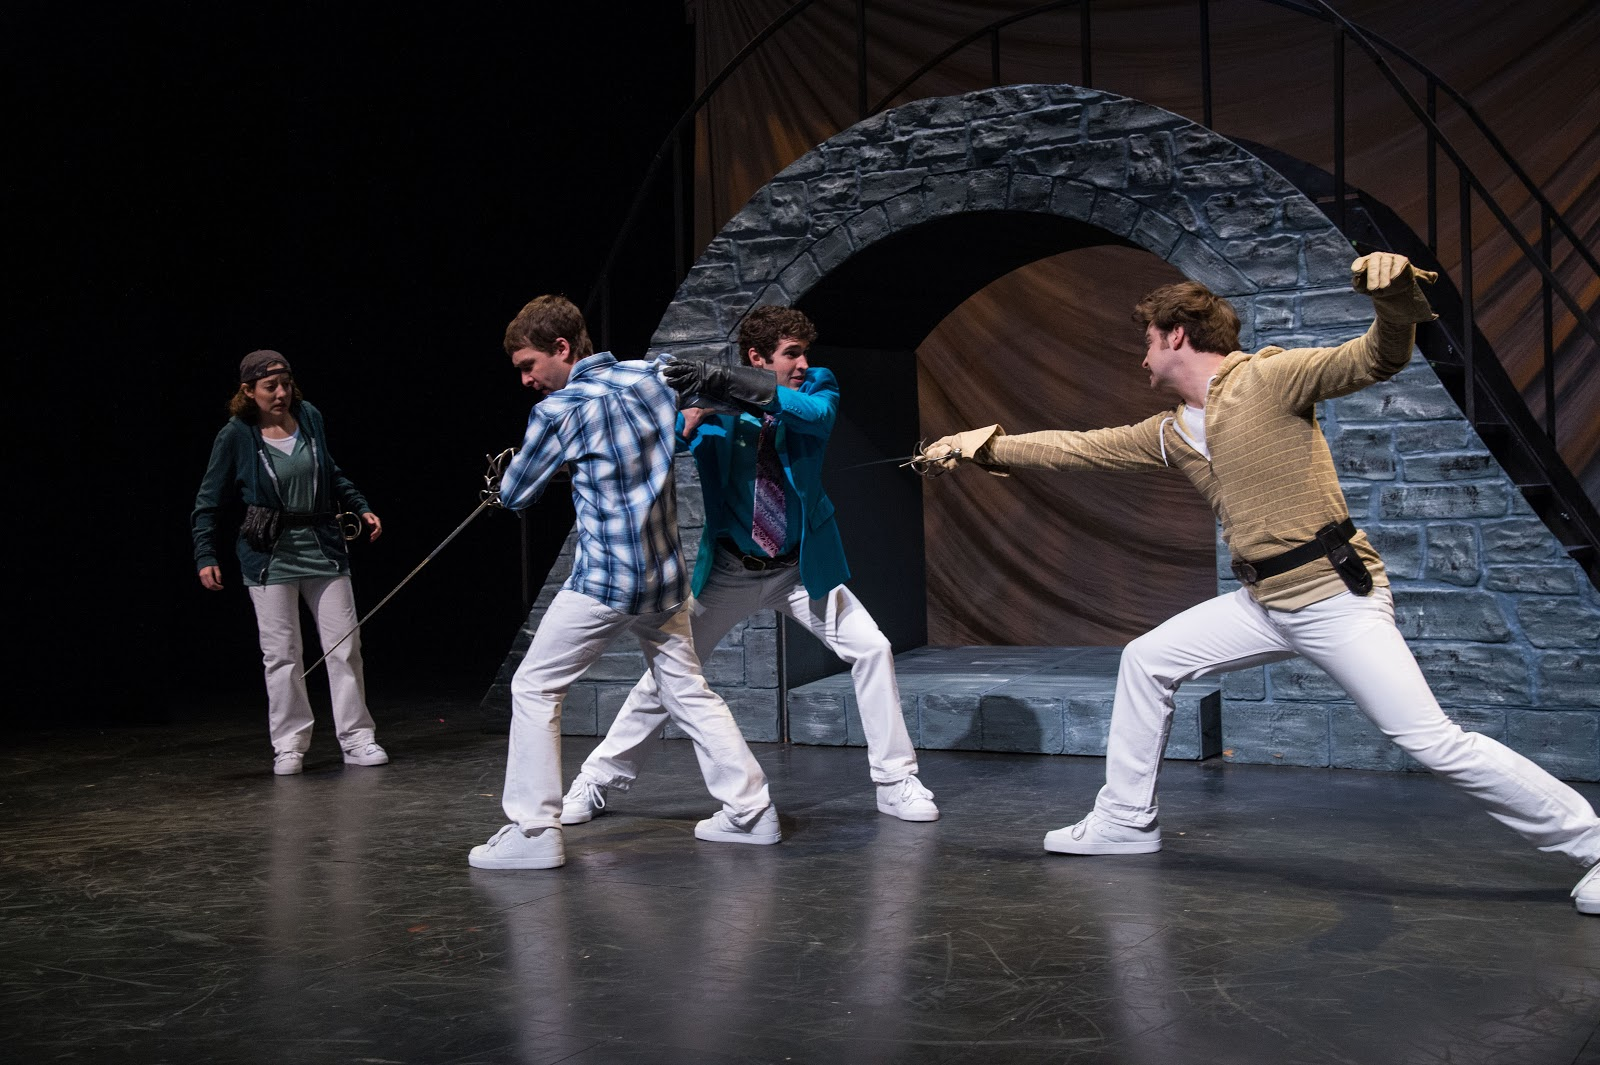 Elyse Edelman (left) as Benvolio, Chris Klopatek as Romeo, Zachary Powell as Mercutio, &JoshuaJames Innerst as Tybalt in theUtah Shakespeare Festival's  Romeo and Juliet.